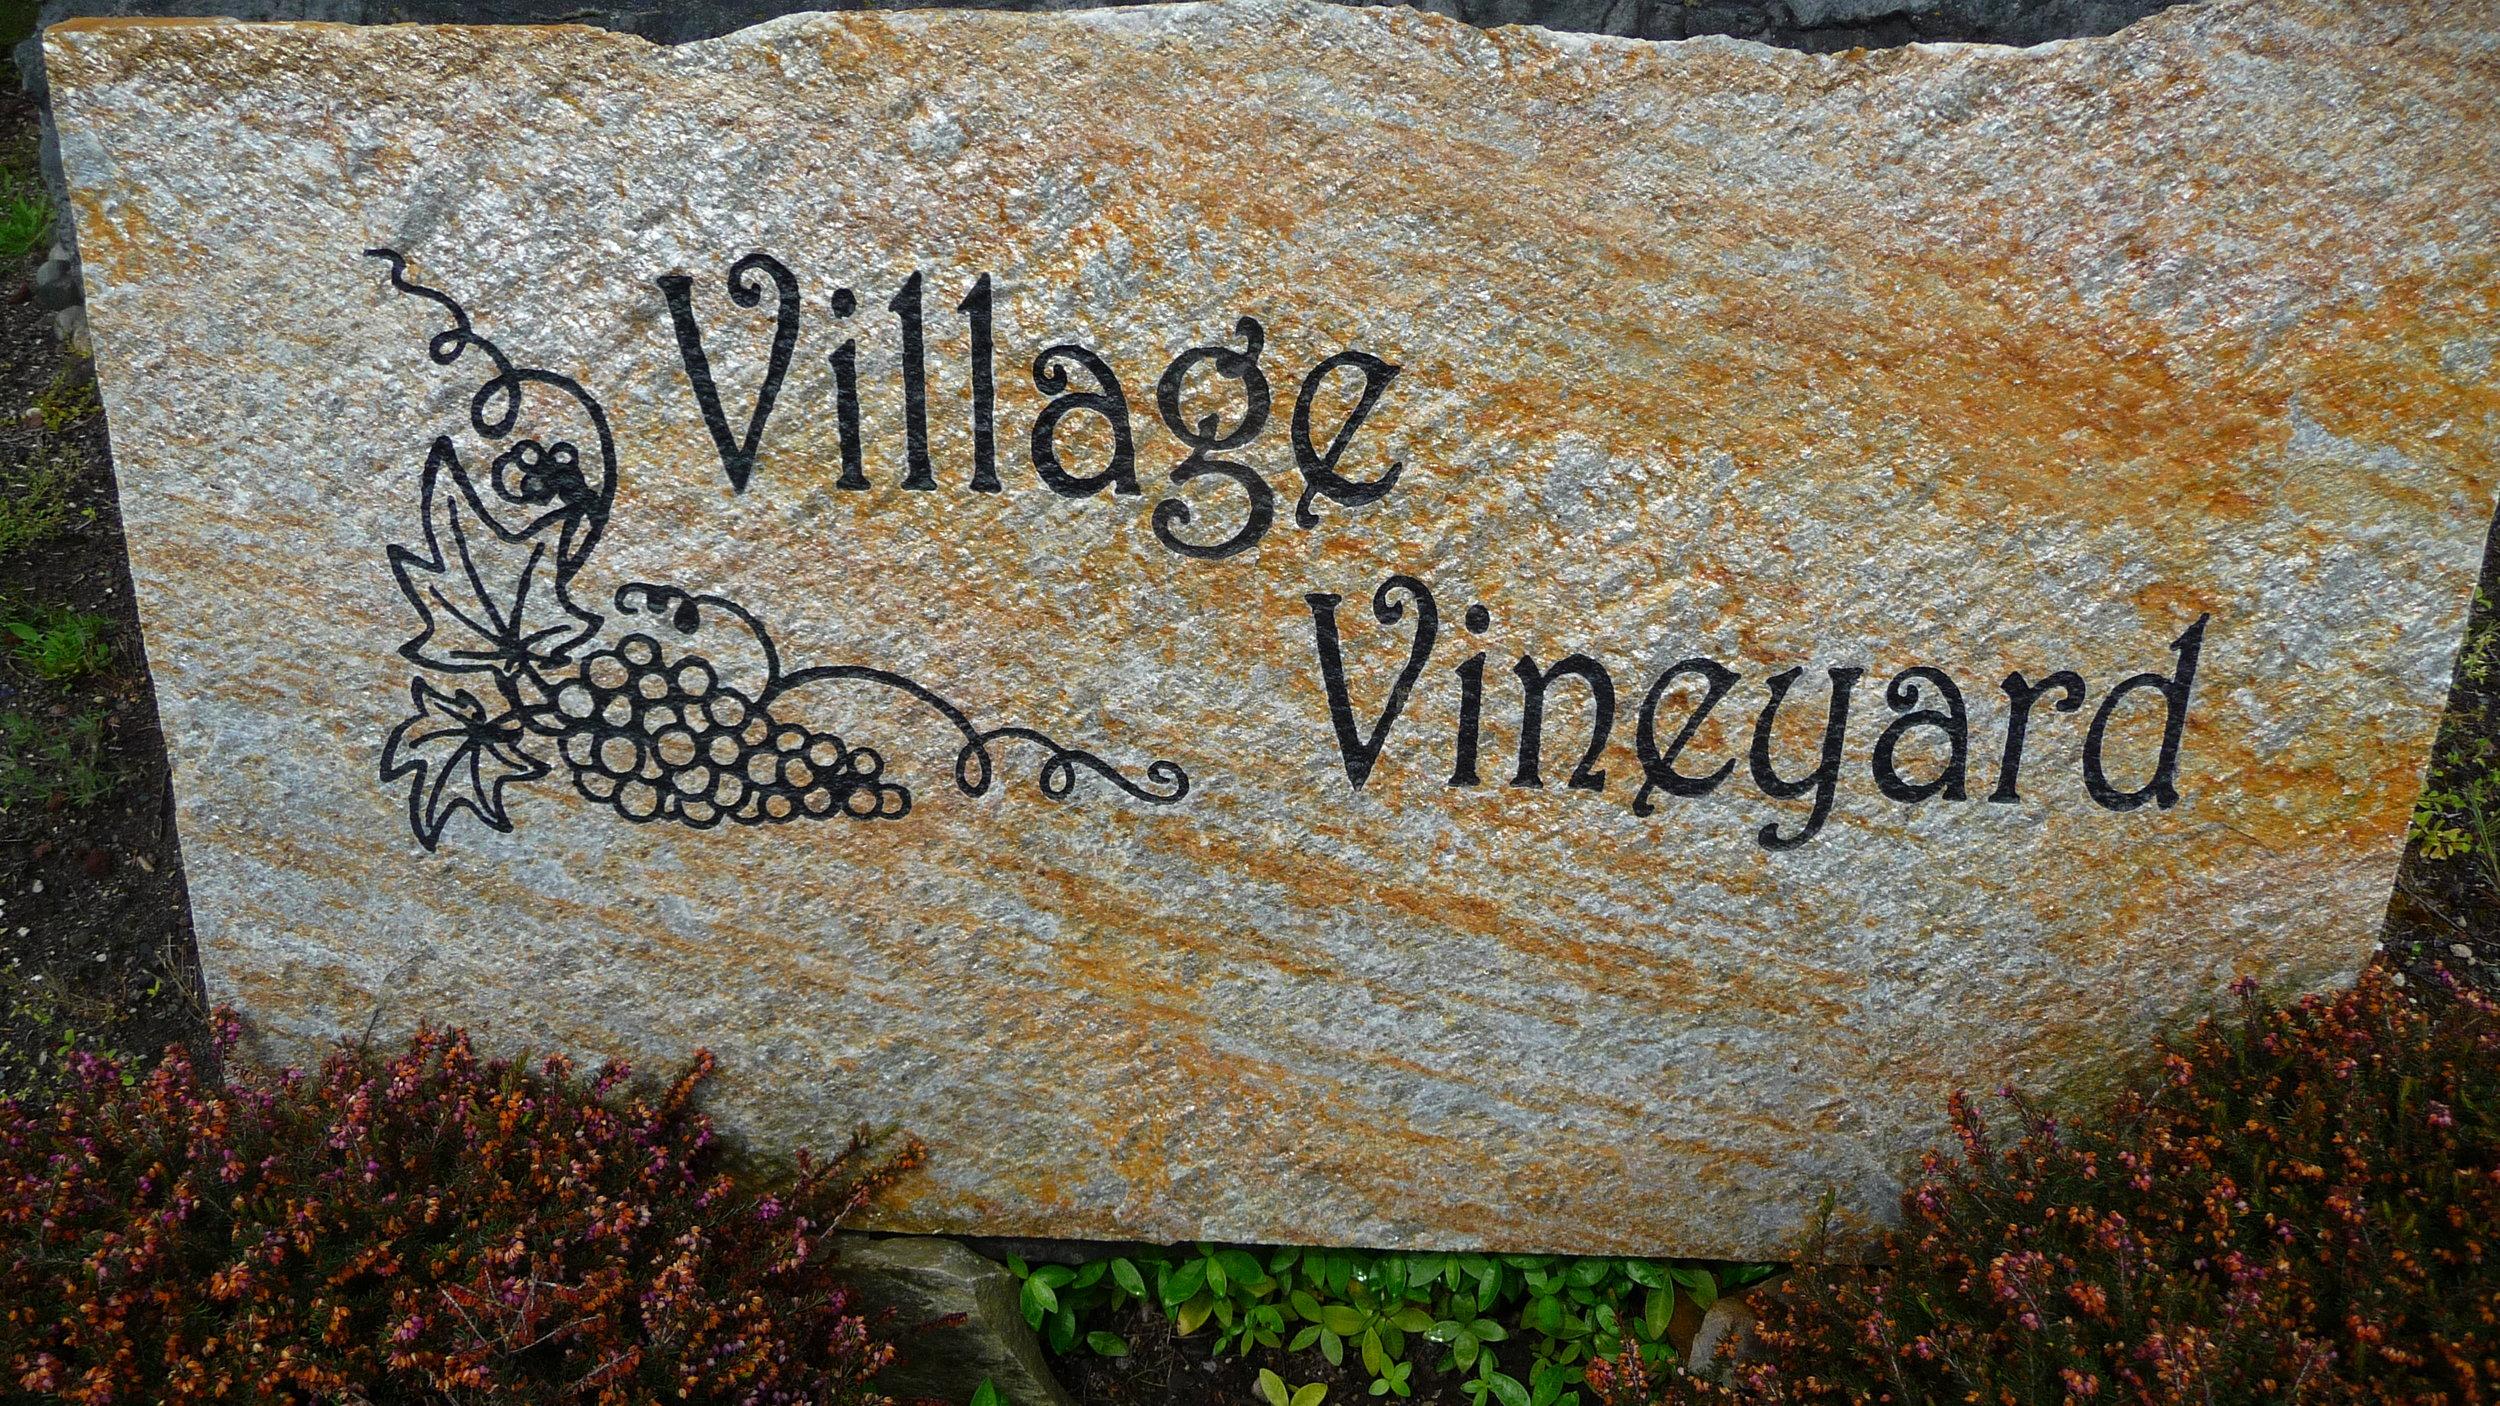 Village-Vineyard.jpg